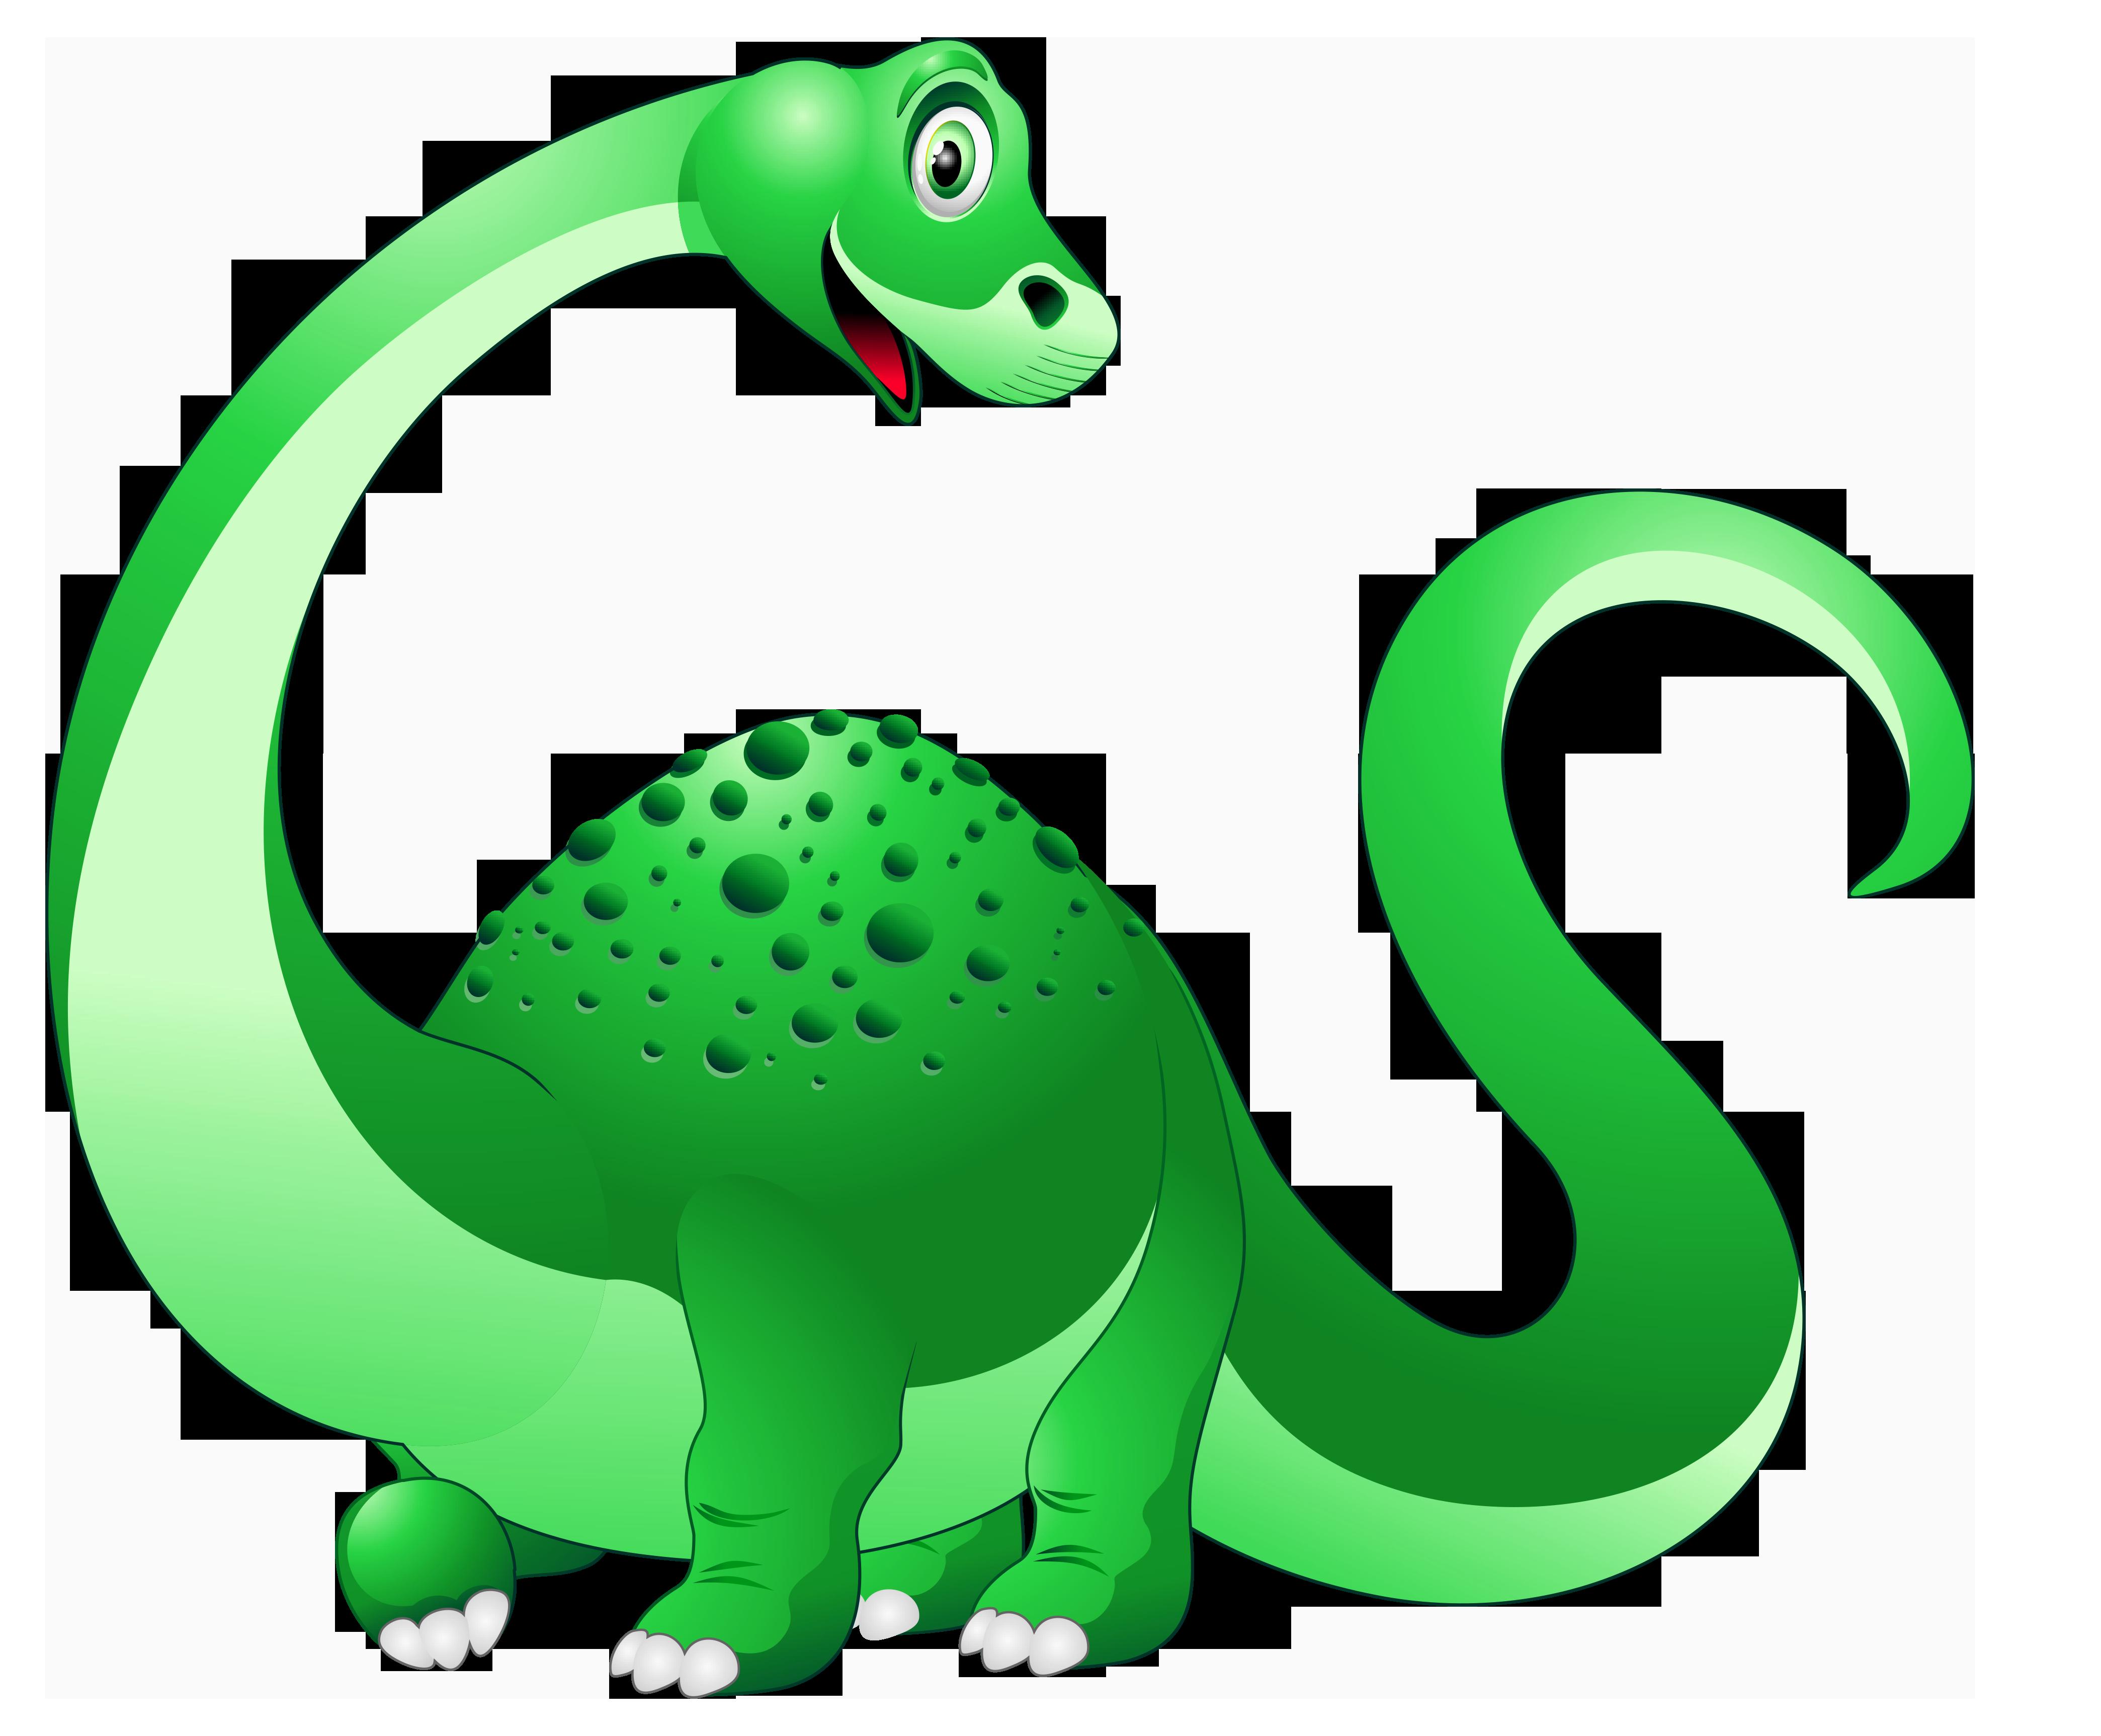 Dinosaur halloween clipart vector royalty free library Dinosaur Cartoon PNG Clipart Image | Gallery Yopriceville - High ... vector royalty free library